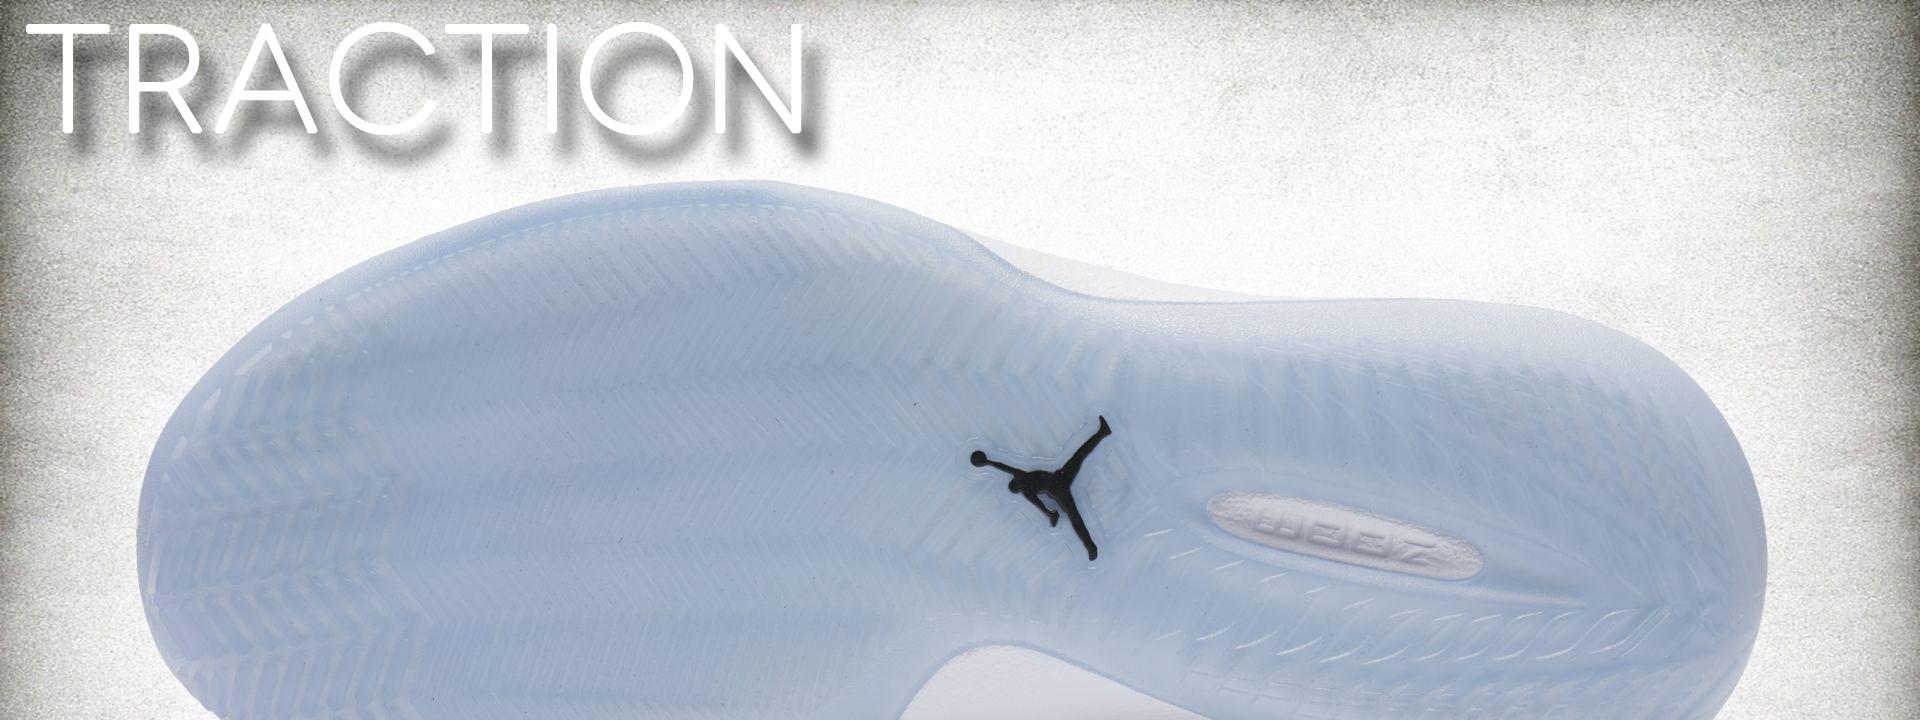 Jordan CP3.XI performance review duke4005 traction